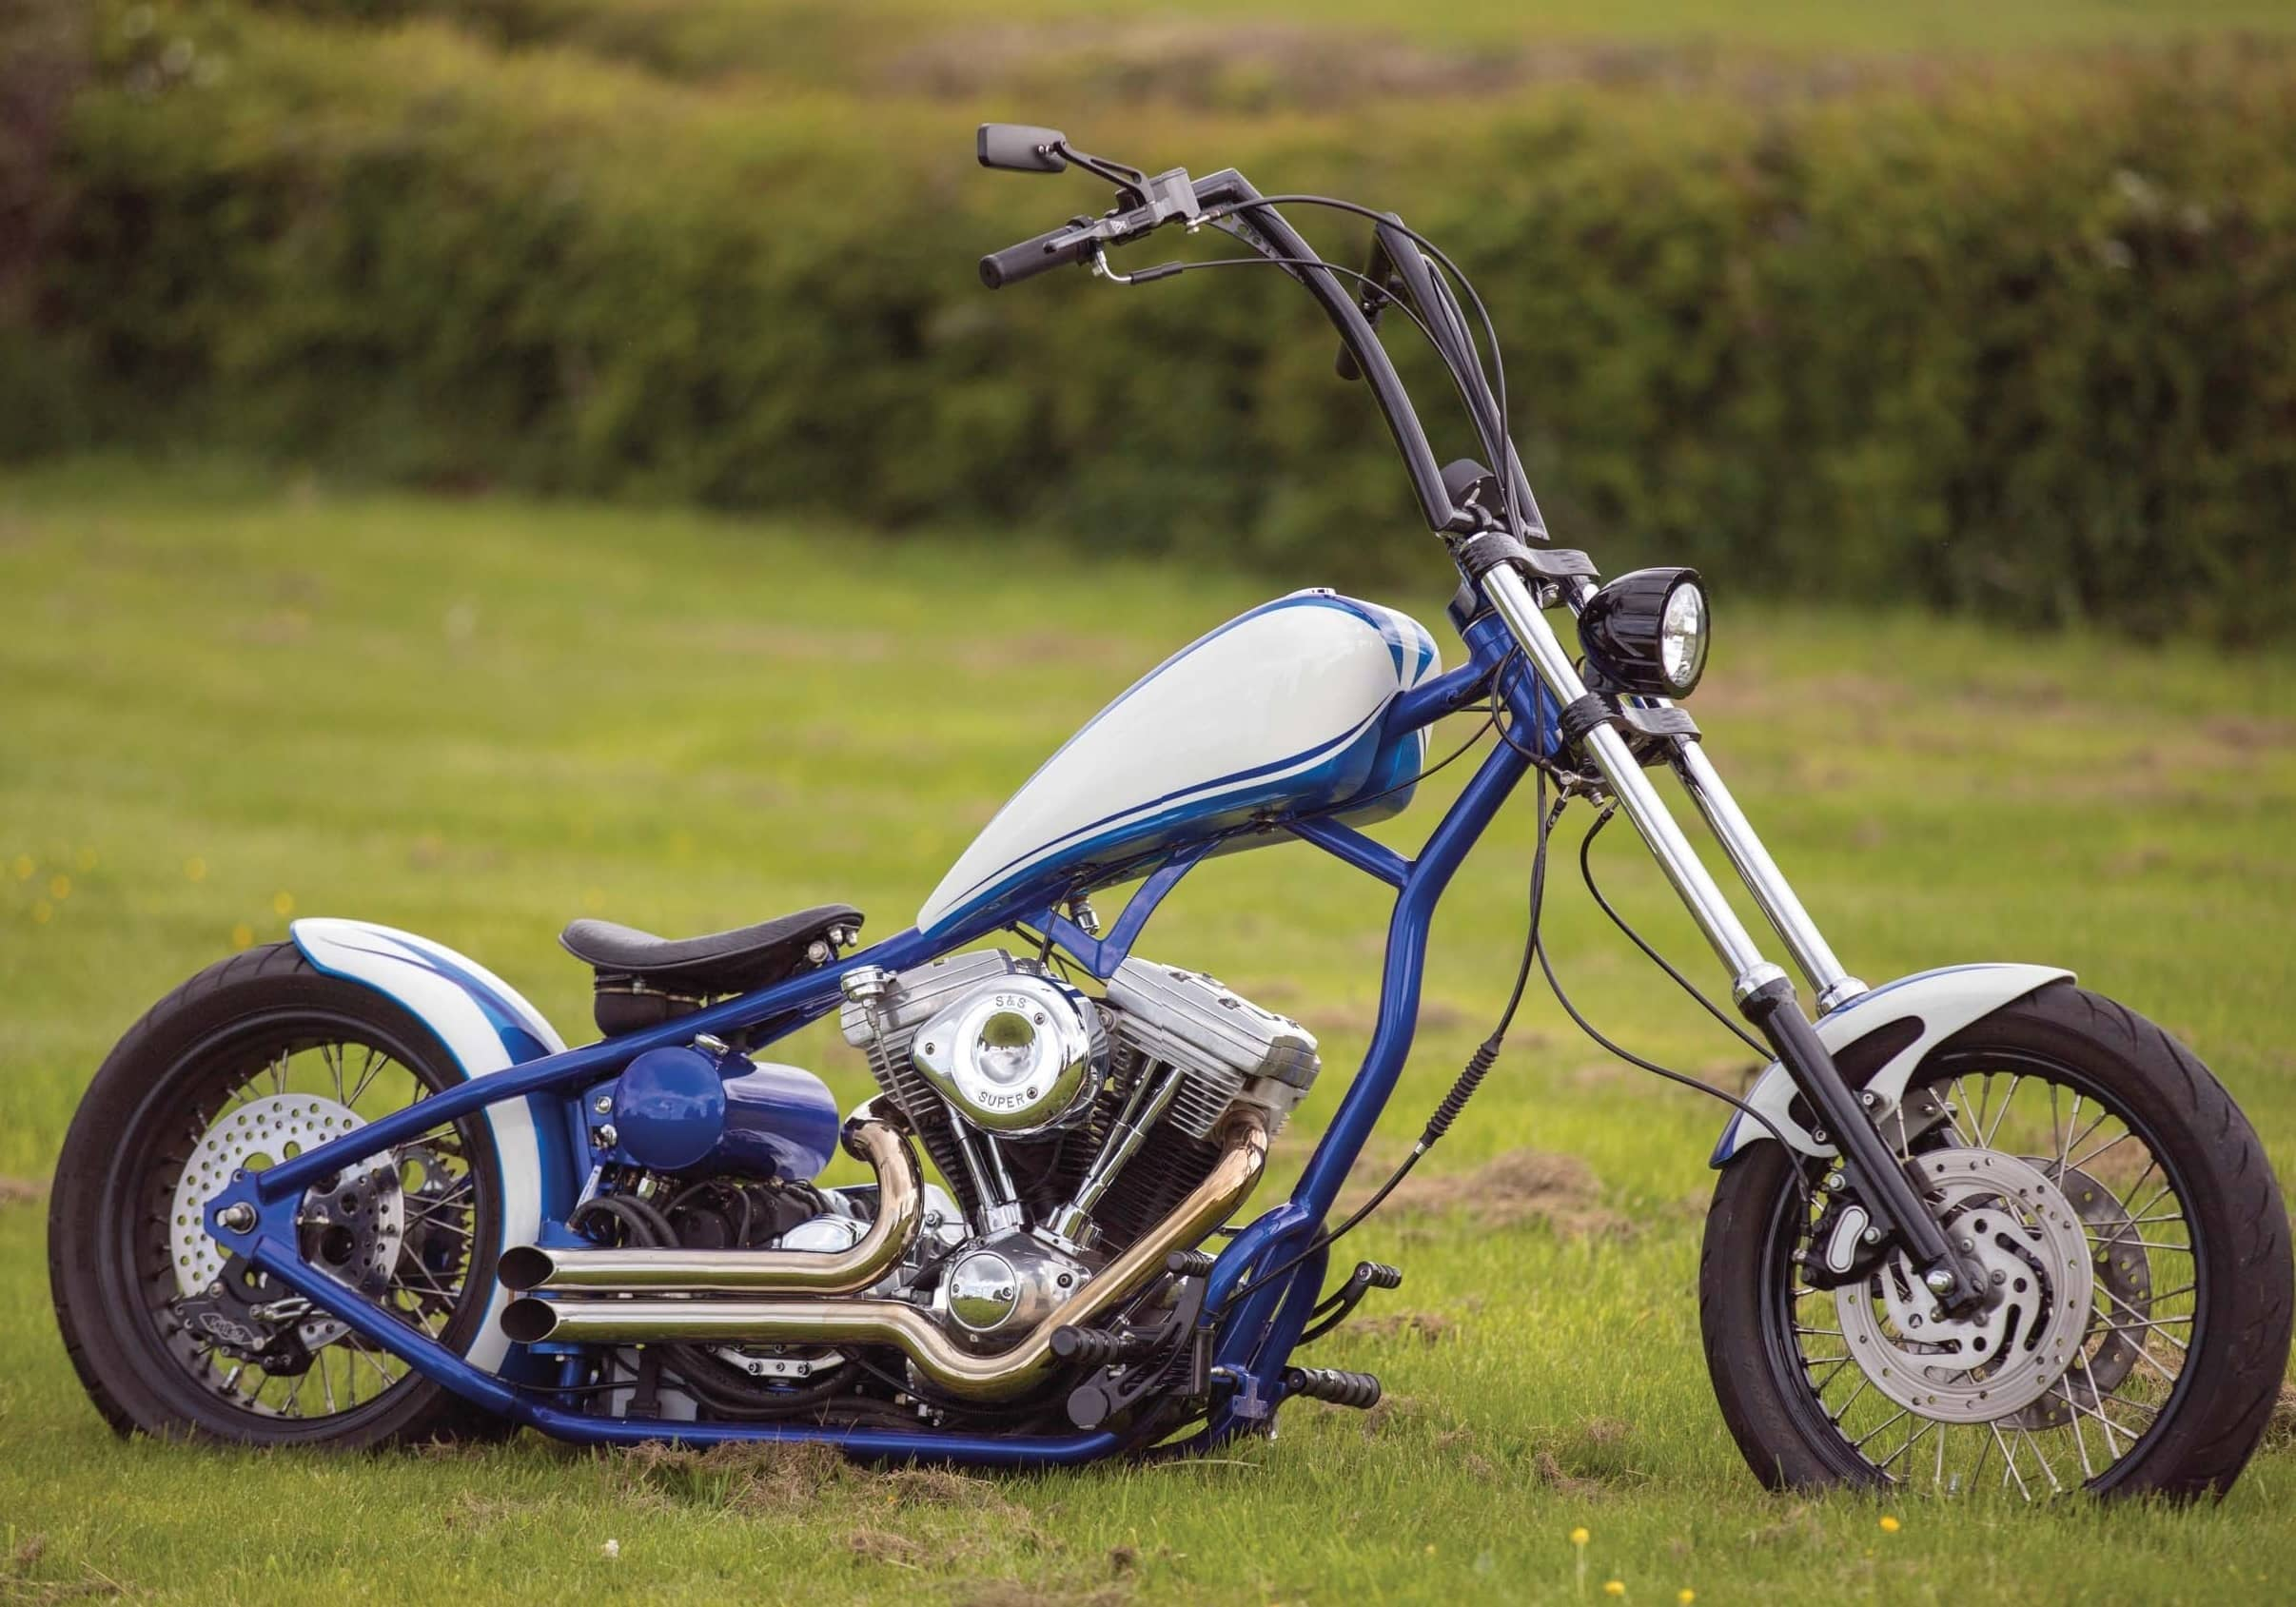 Paul's Harley